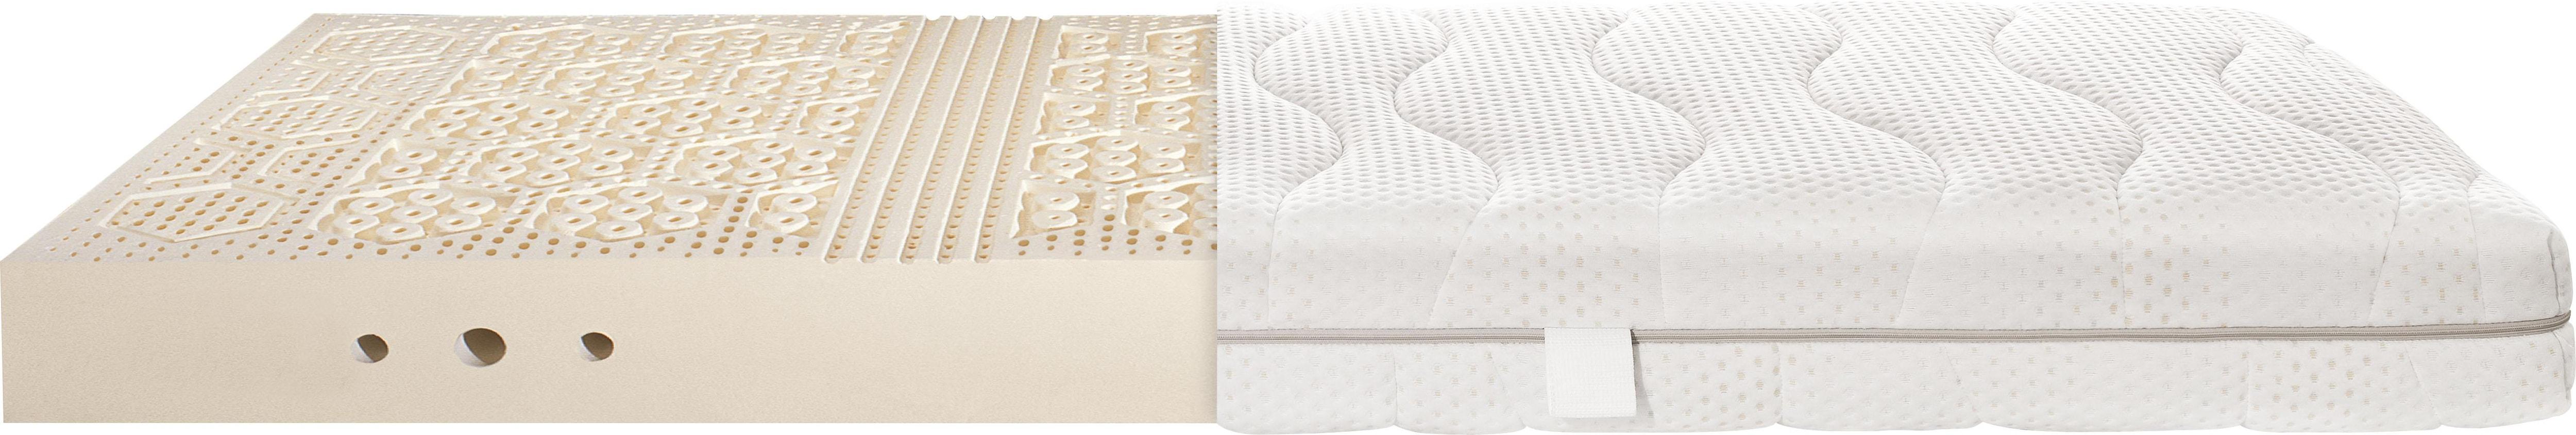 Latexmatratze Selecta L4 Latexmatratze, Selecta, 17 cm hoch | Schlafzimmer > Matratzen > Latexmatratzen | Selecta